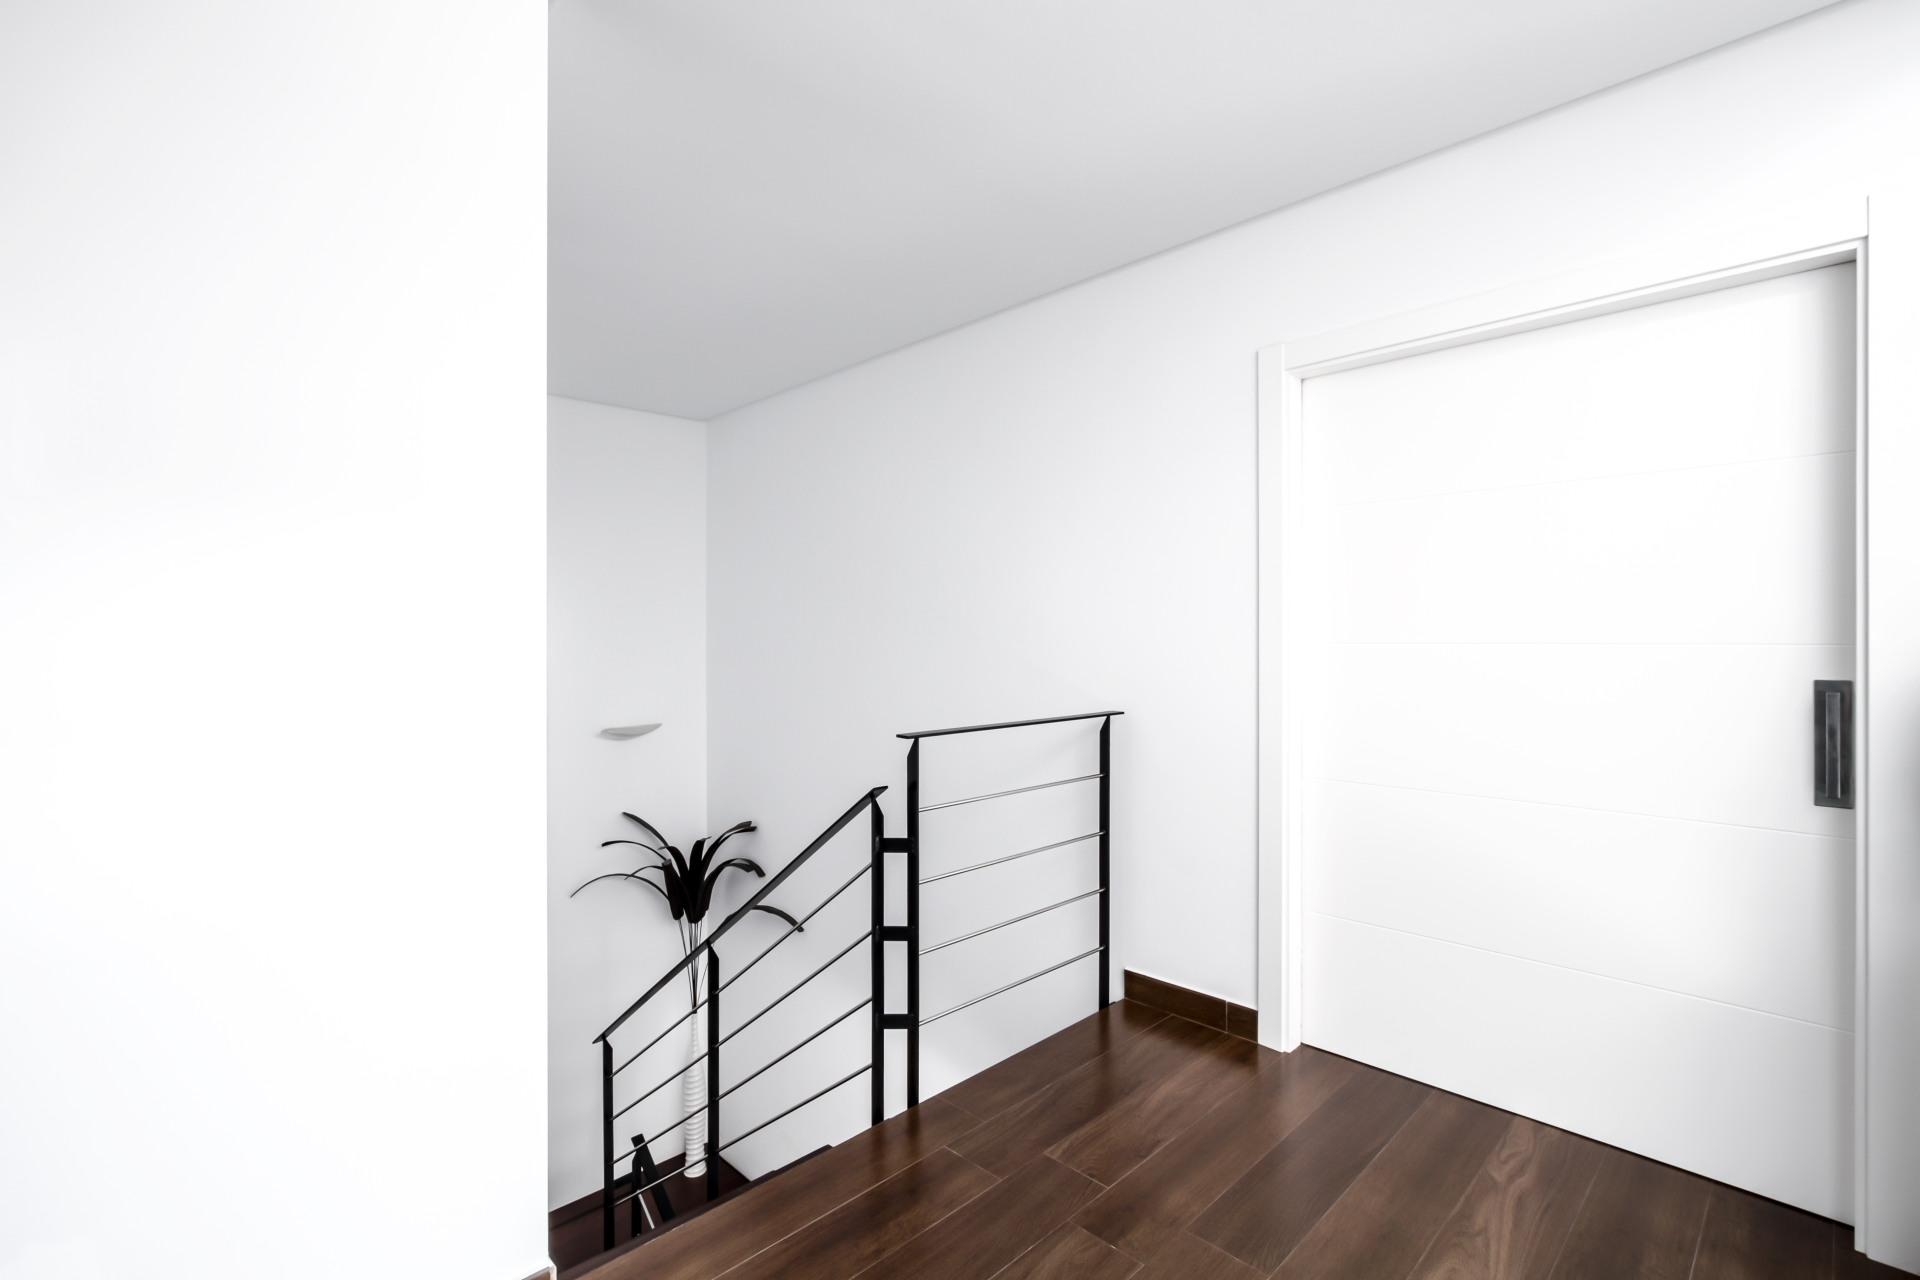 fotografia-arquitectura-valencia-german-cabo-viraje-v02 (14)